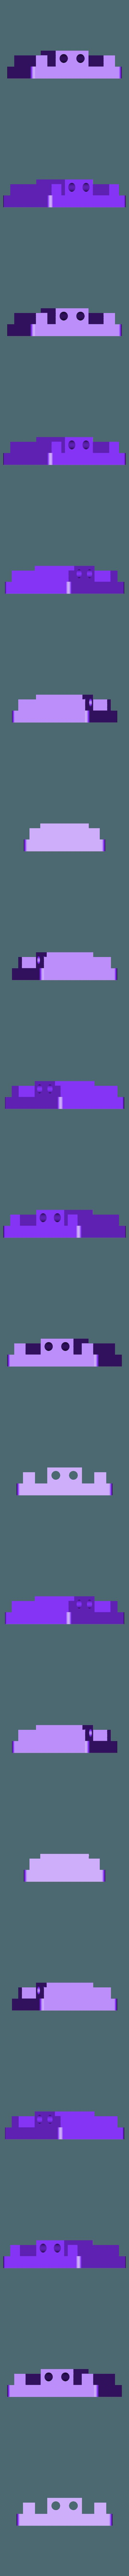 rampes scx24 jonction plane.STL Download STL file AXIAL SCX24 mini or micro crawler Bridge 100 mm • Object to 3D print, lulu3Dbuilder